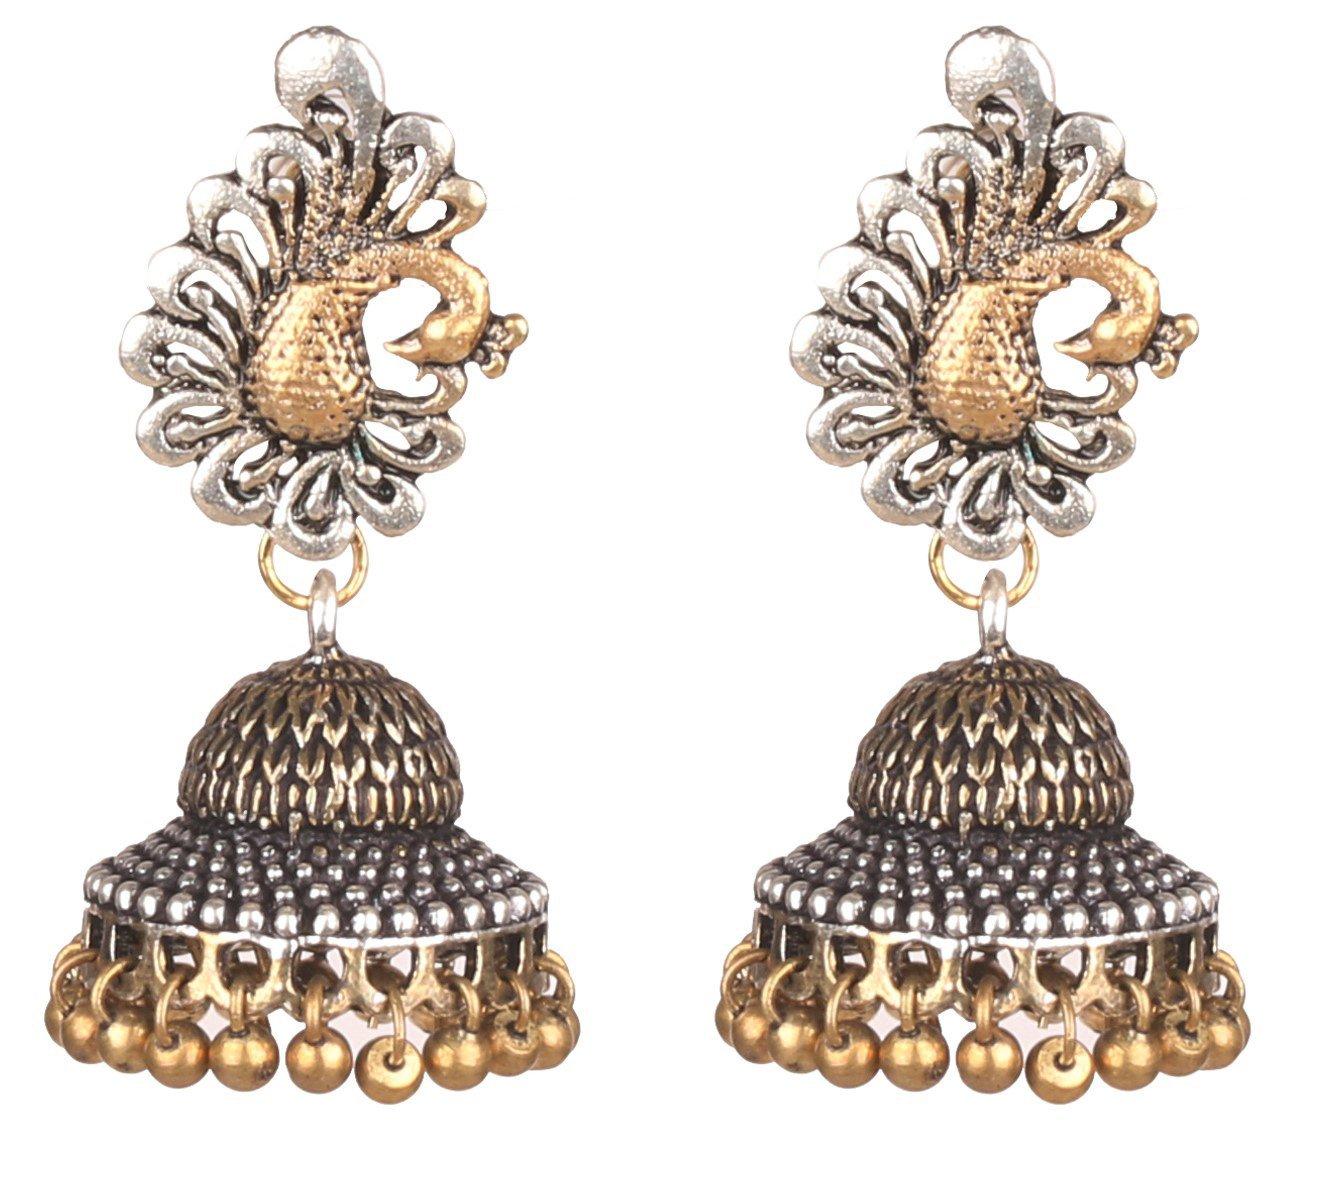 Sansar India Oxidized Dual Tone Peacock Stud Jhumka Jhumki Indian Earrings Jewelry for Girls and Women